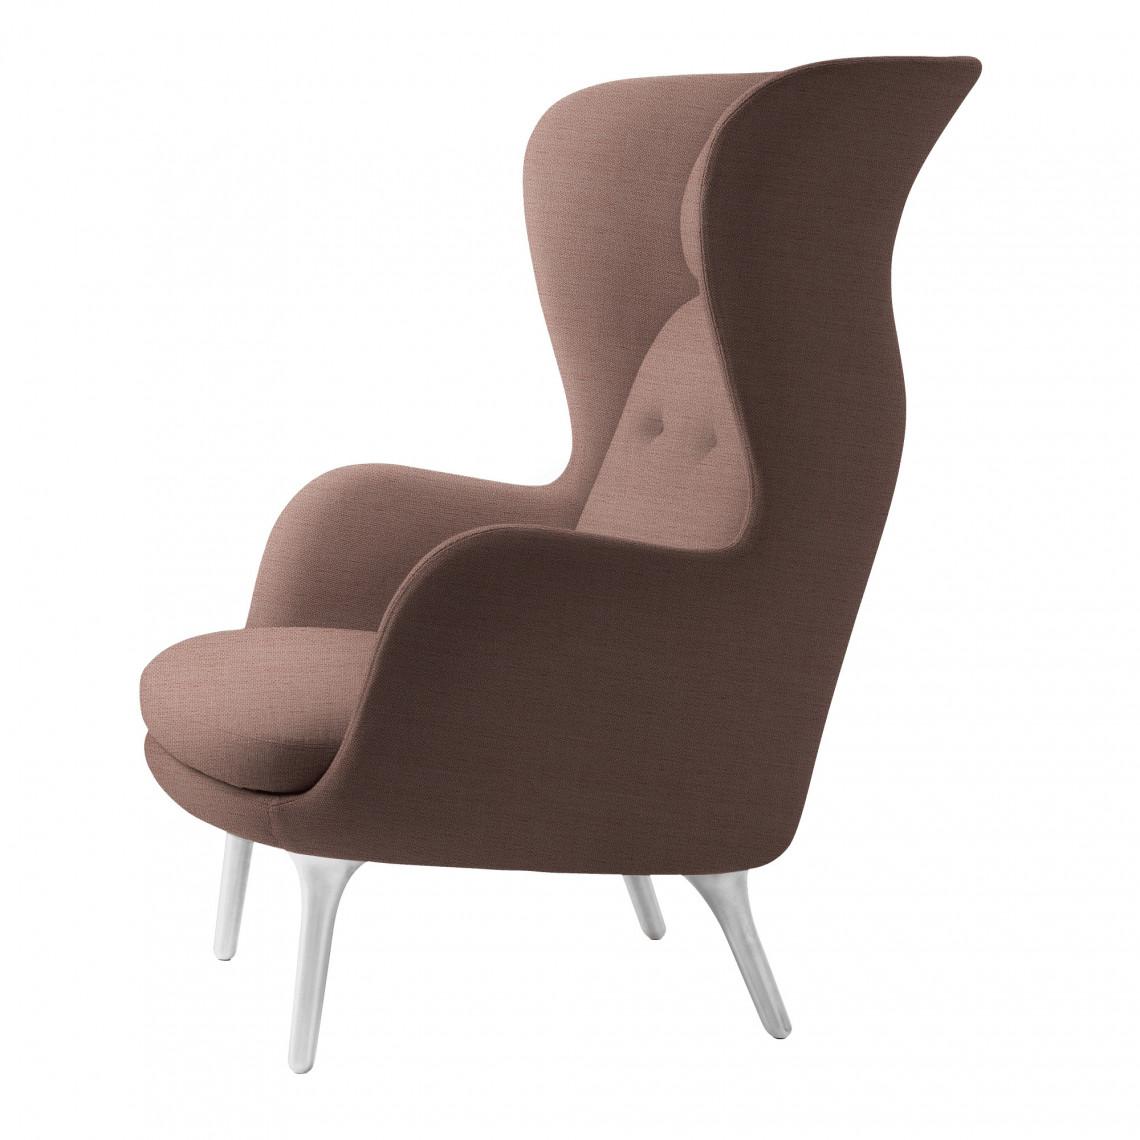 Lounge fåtölj RO™ - Klädd i tyg Christianshavn